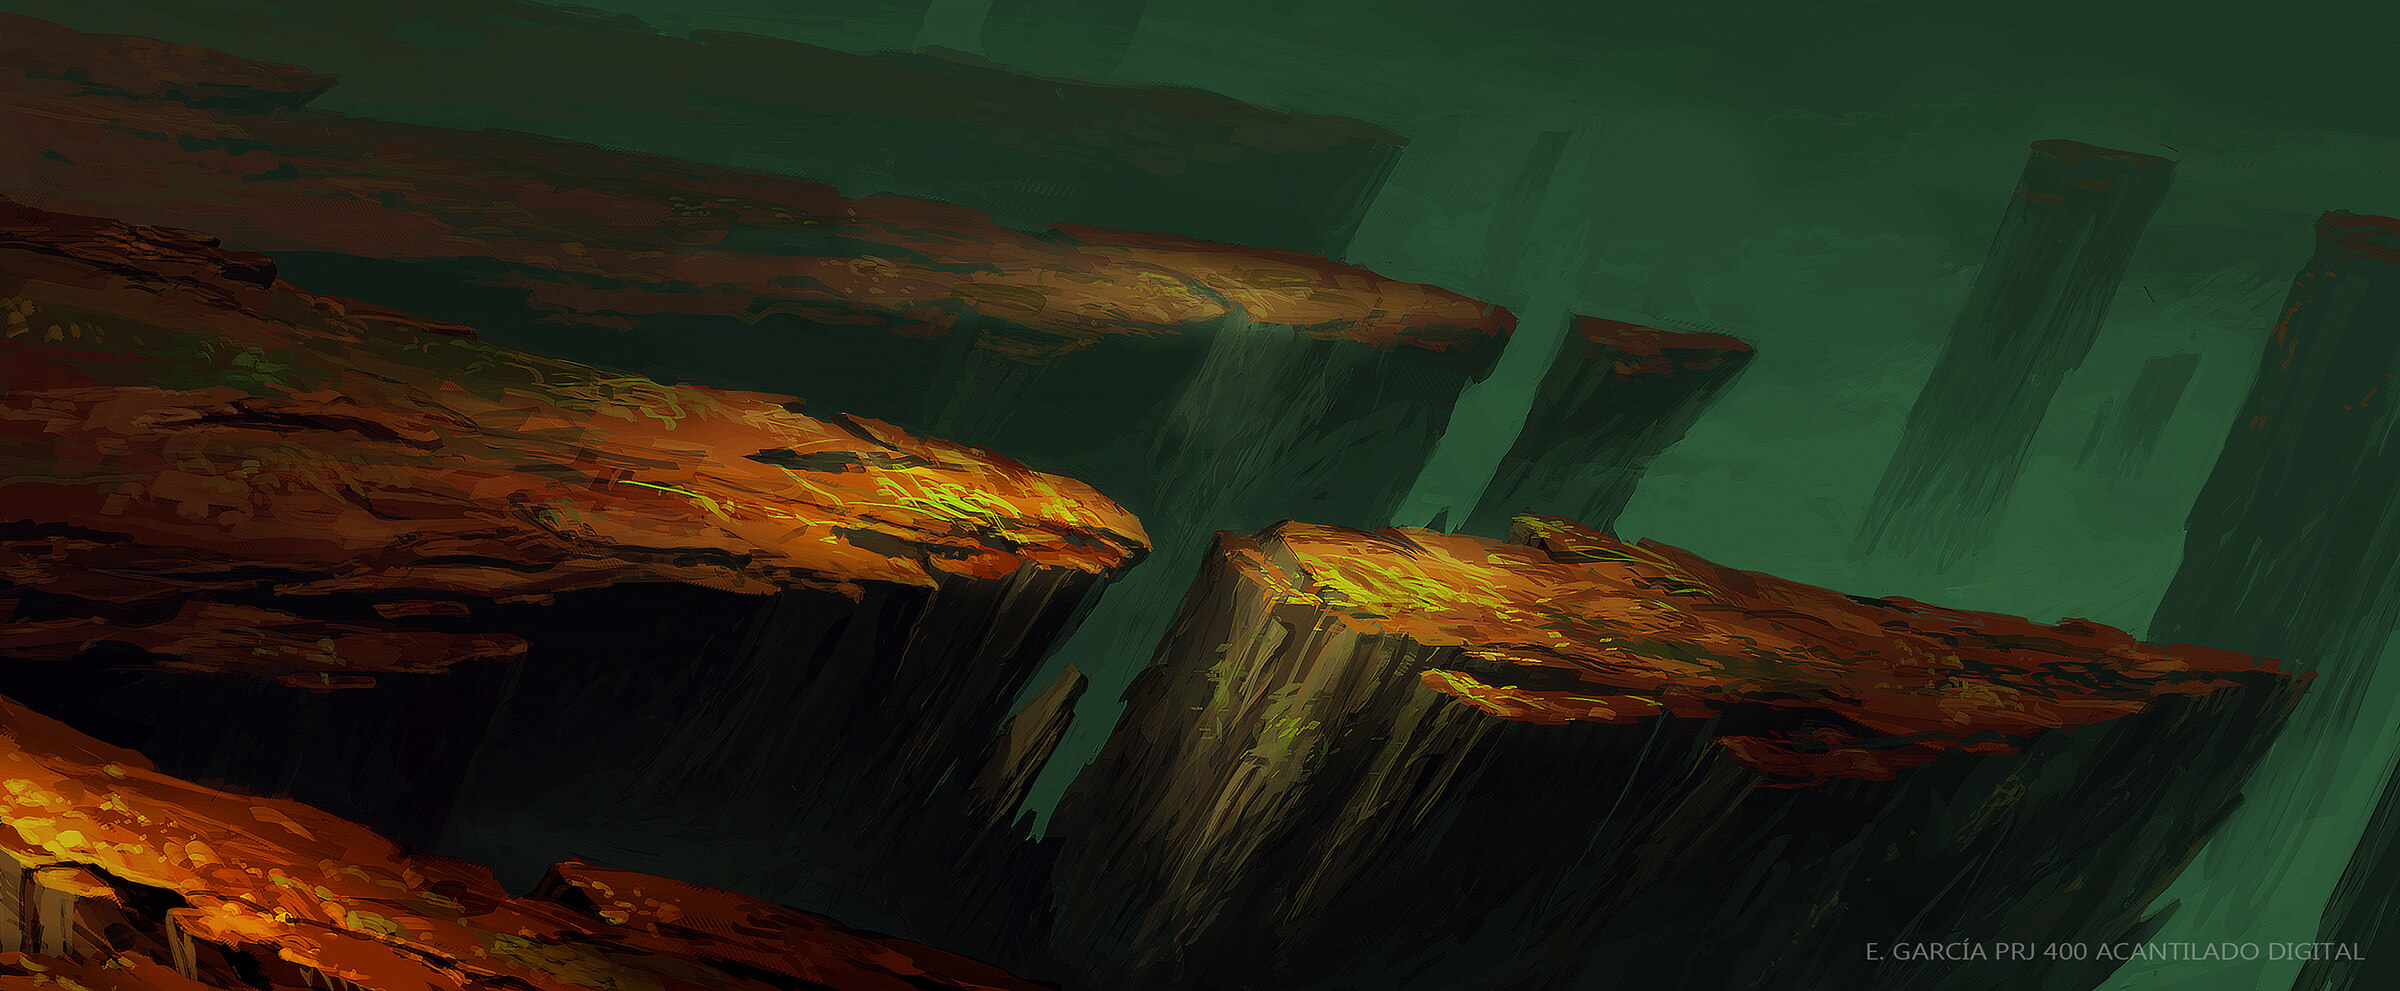 Jagged, red cliffs in an alien landscape jut ominously into a dark green sky.